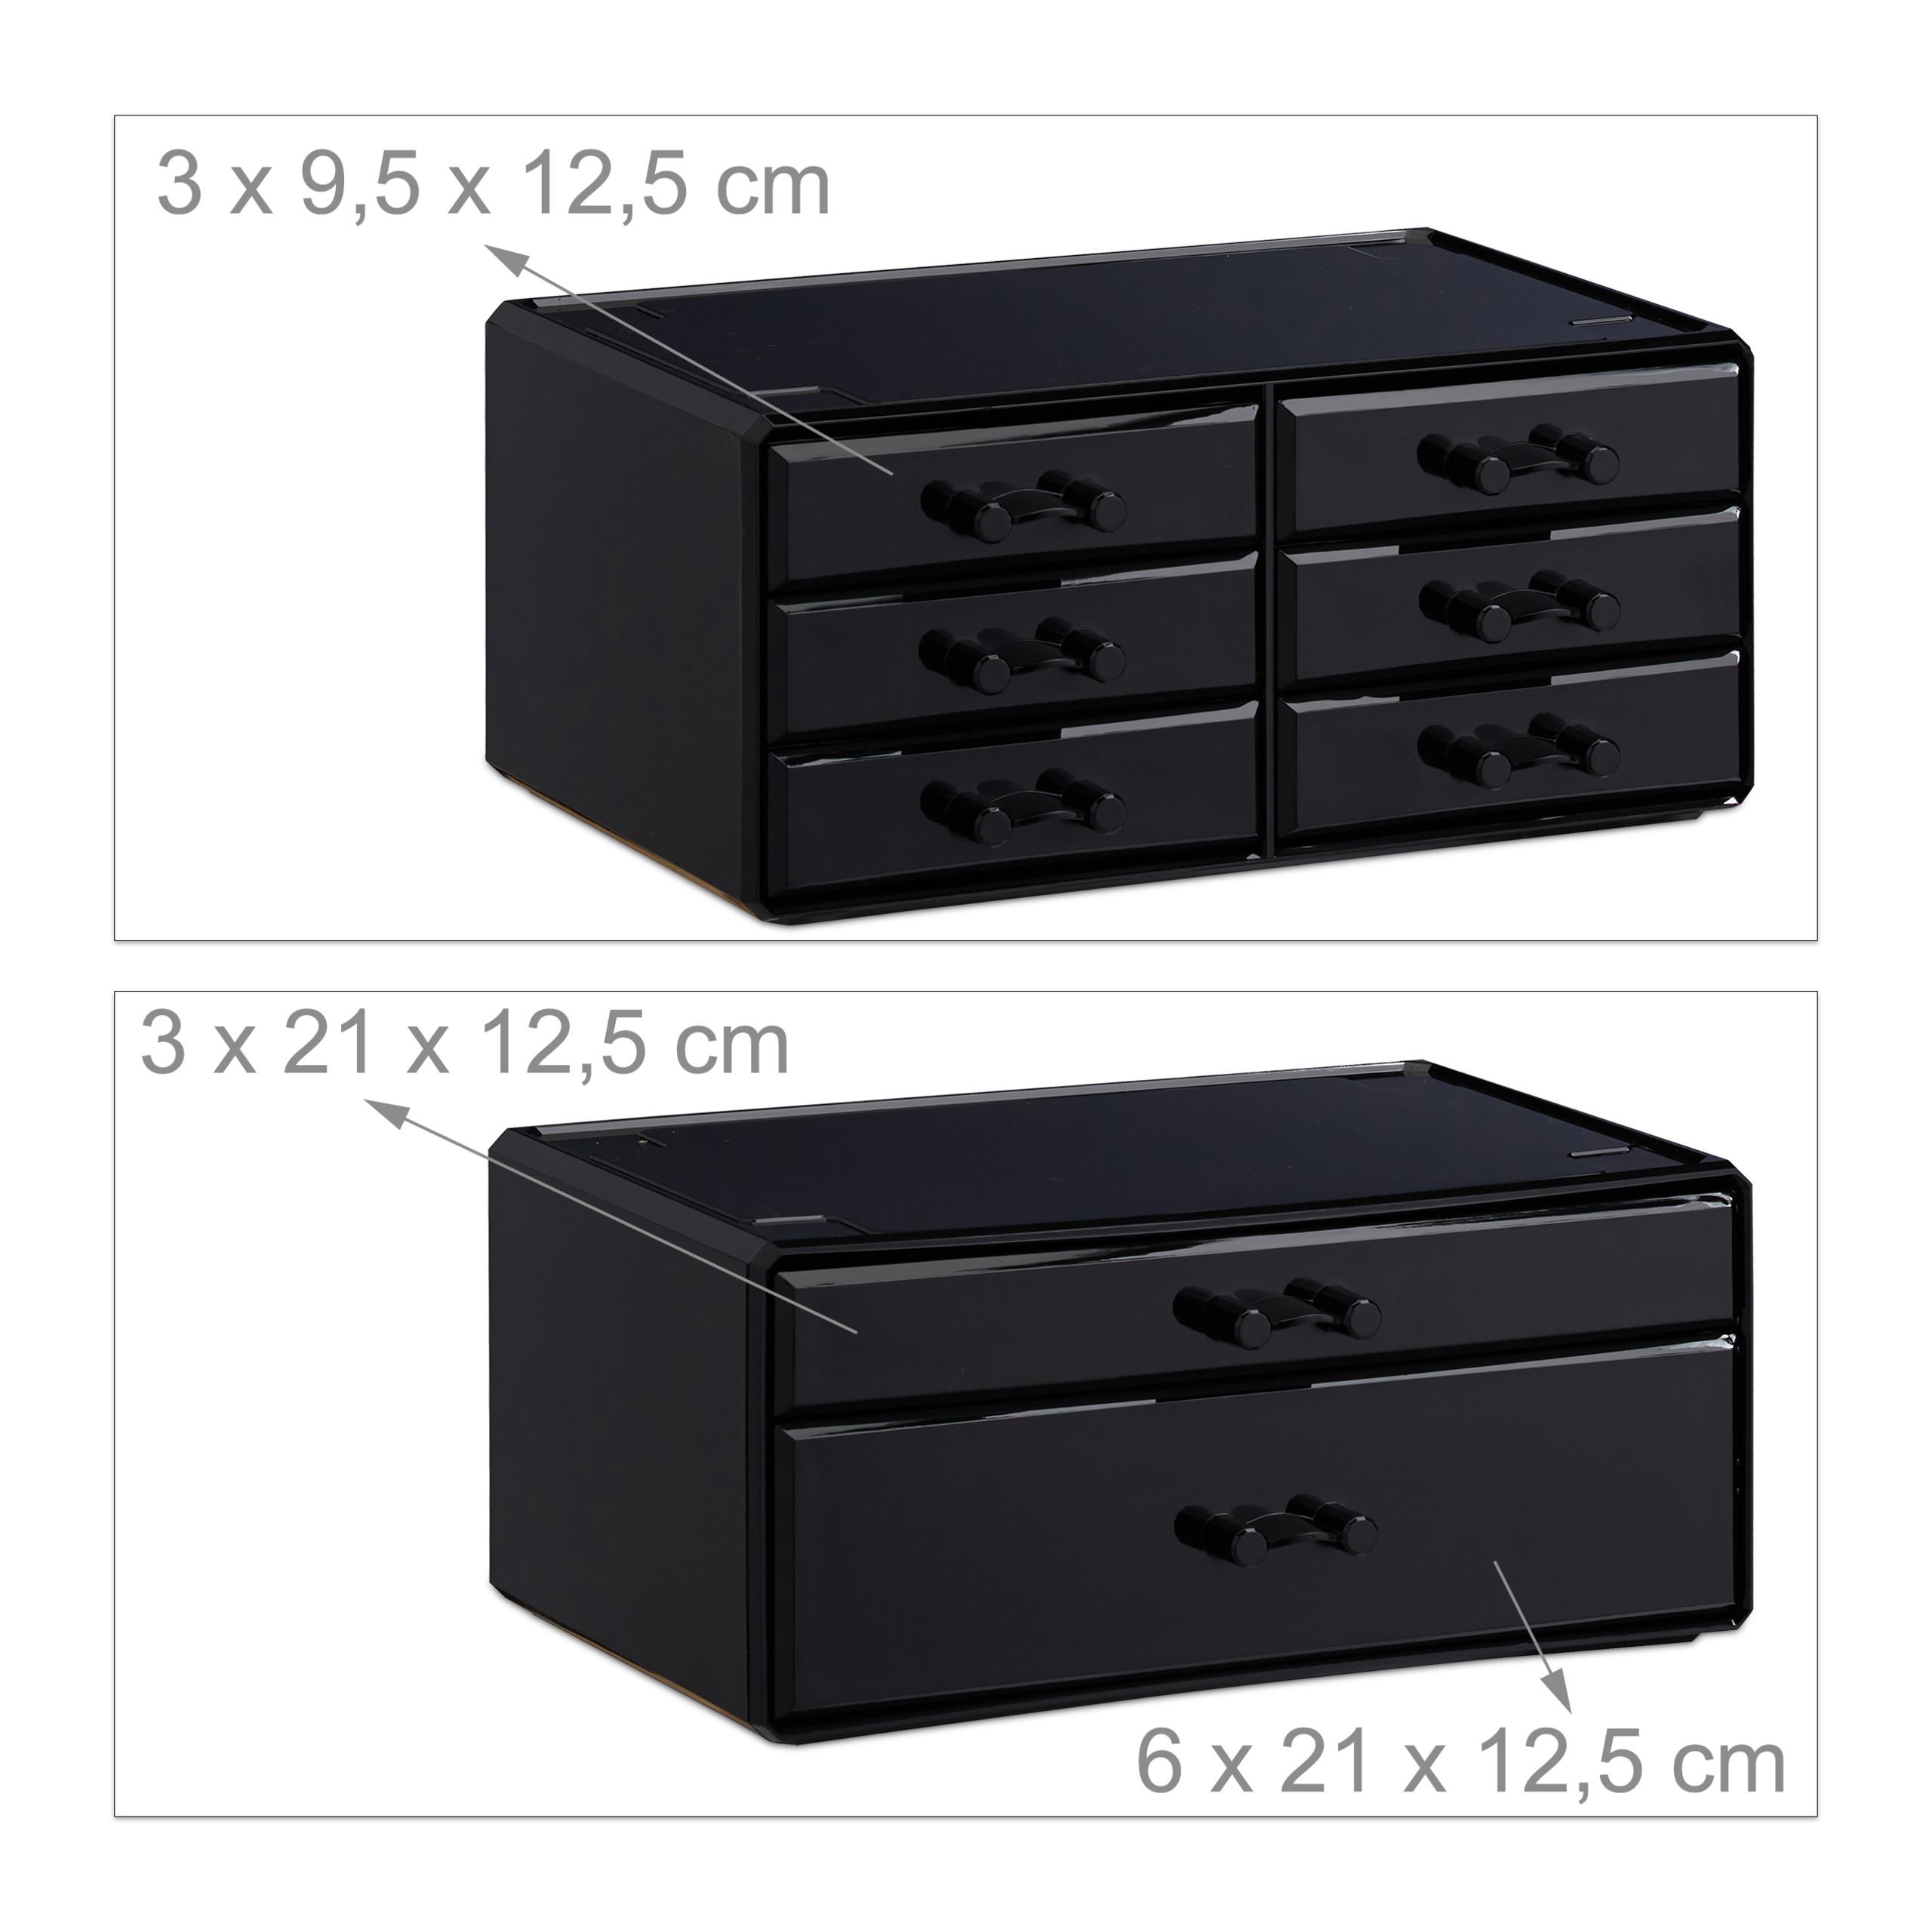 make-up-organizer-opbergen-van-cosmetica-acryl-stapelbaar-met-lades miniatuur 33